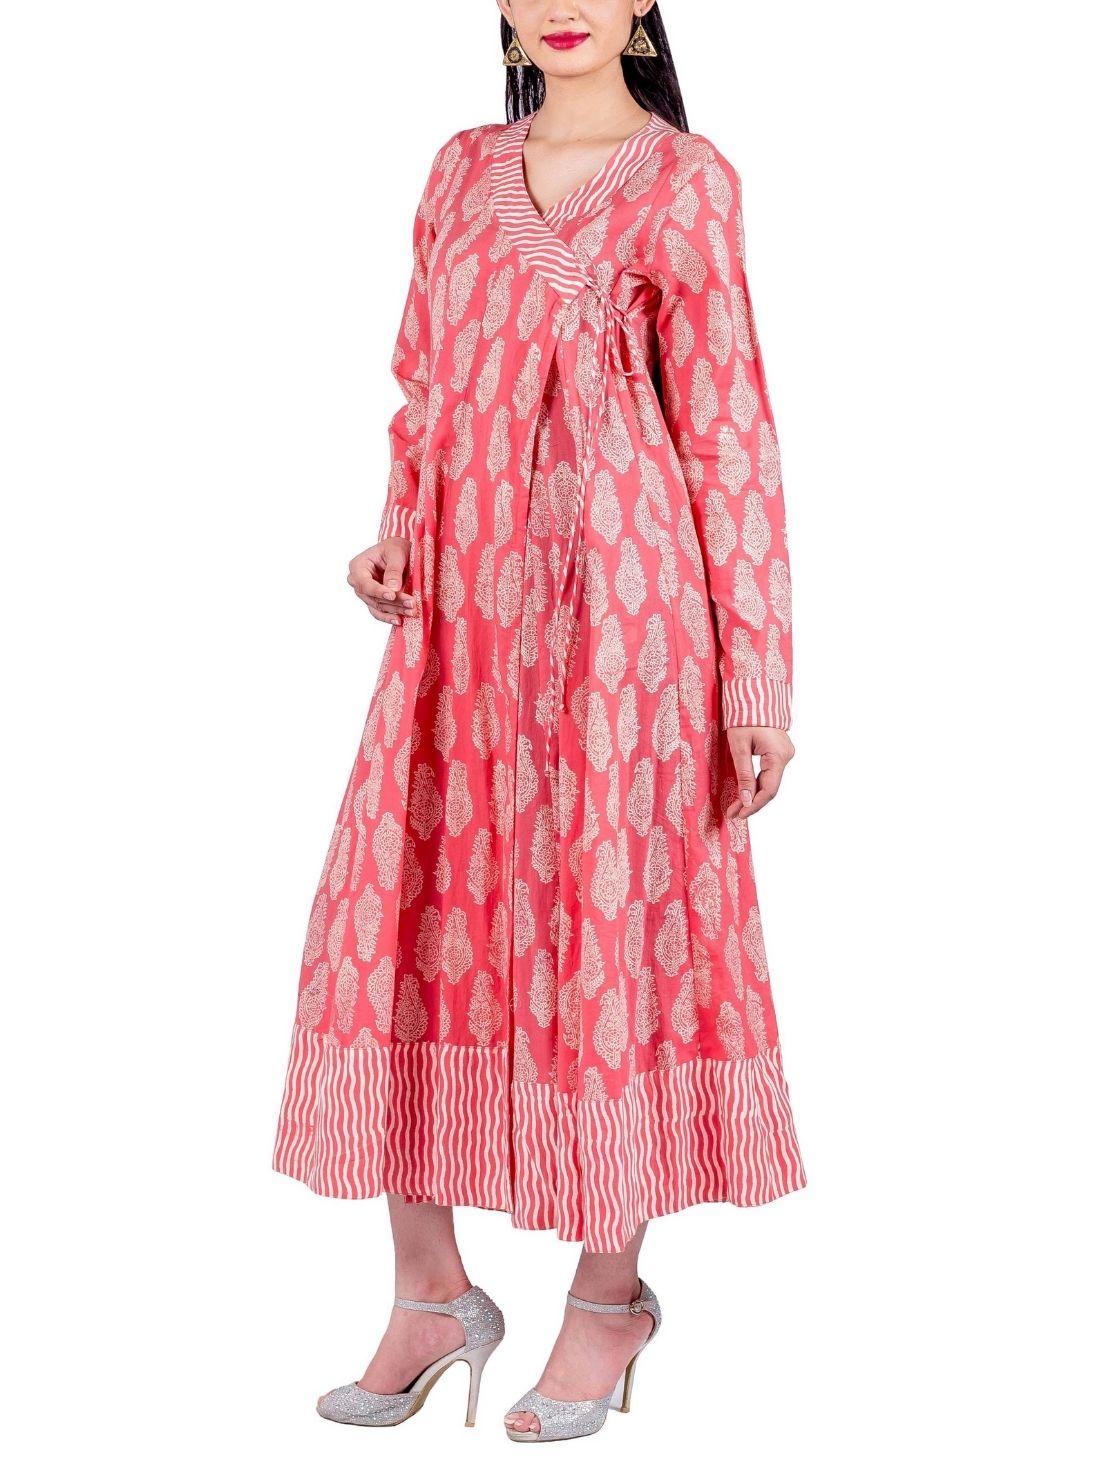 Wholesale Floral Western Dresses